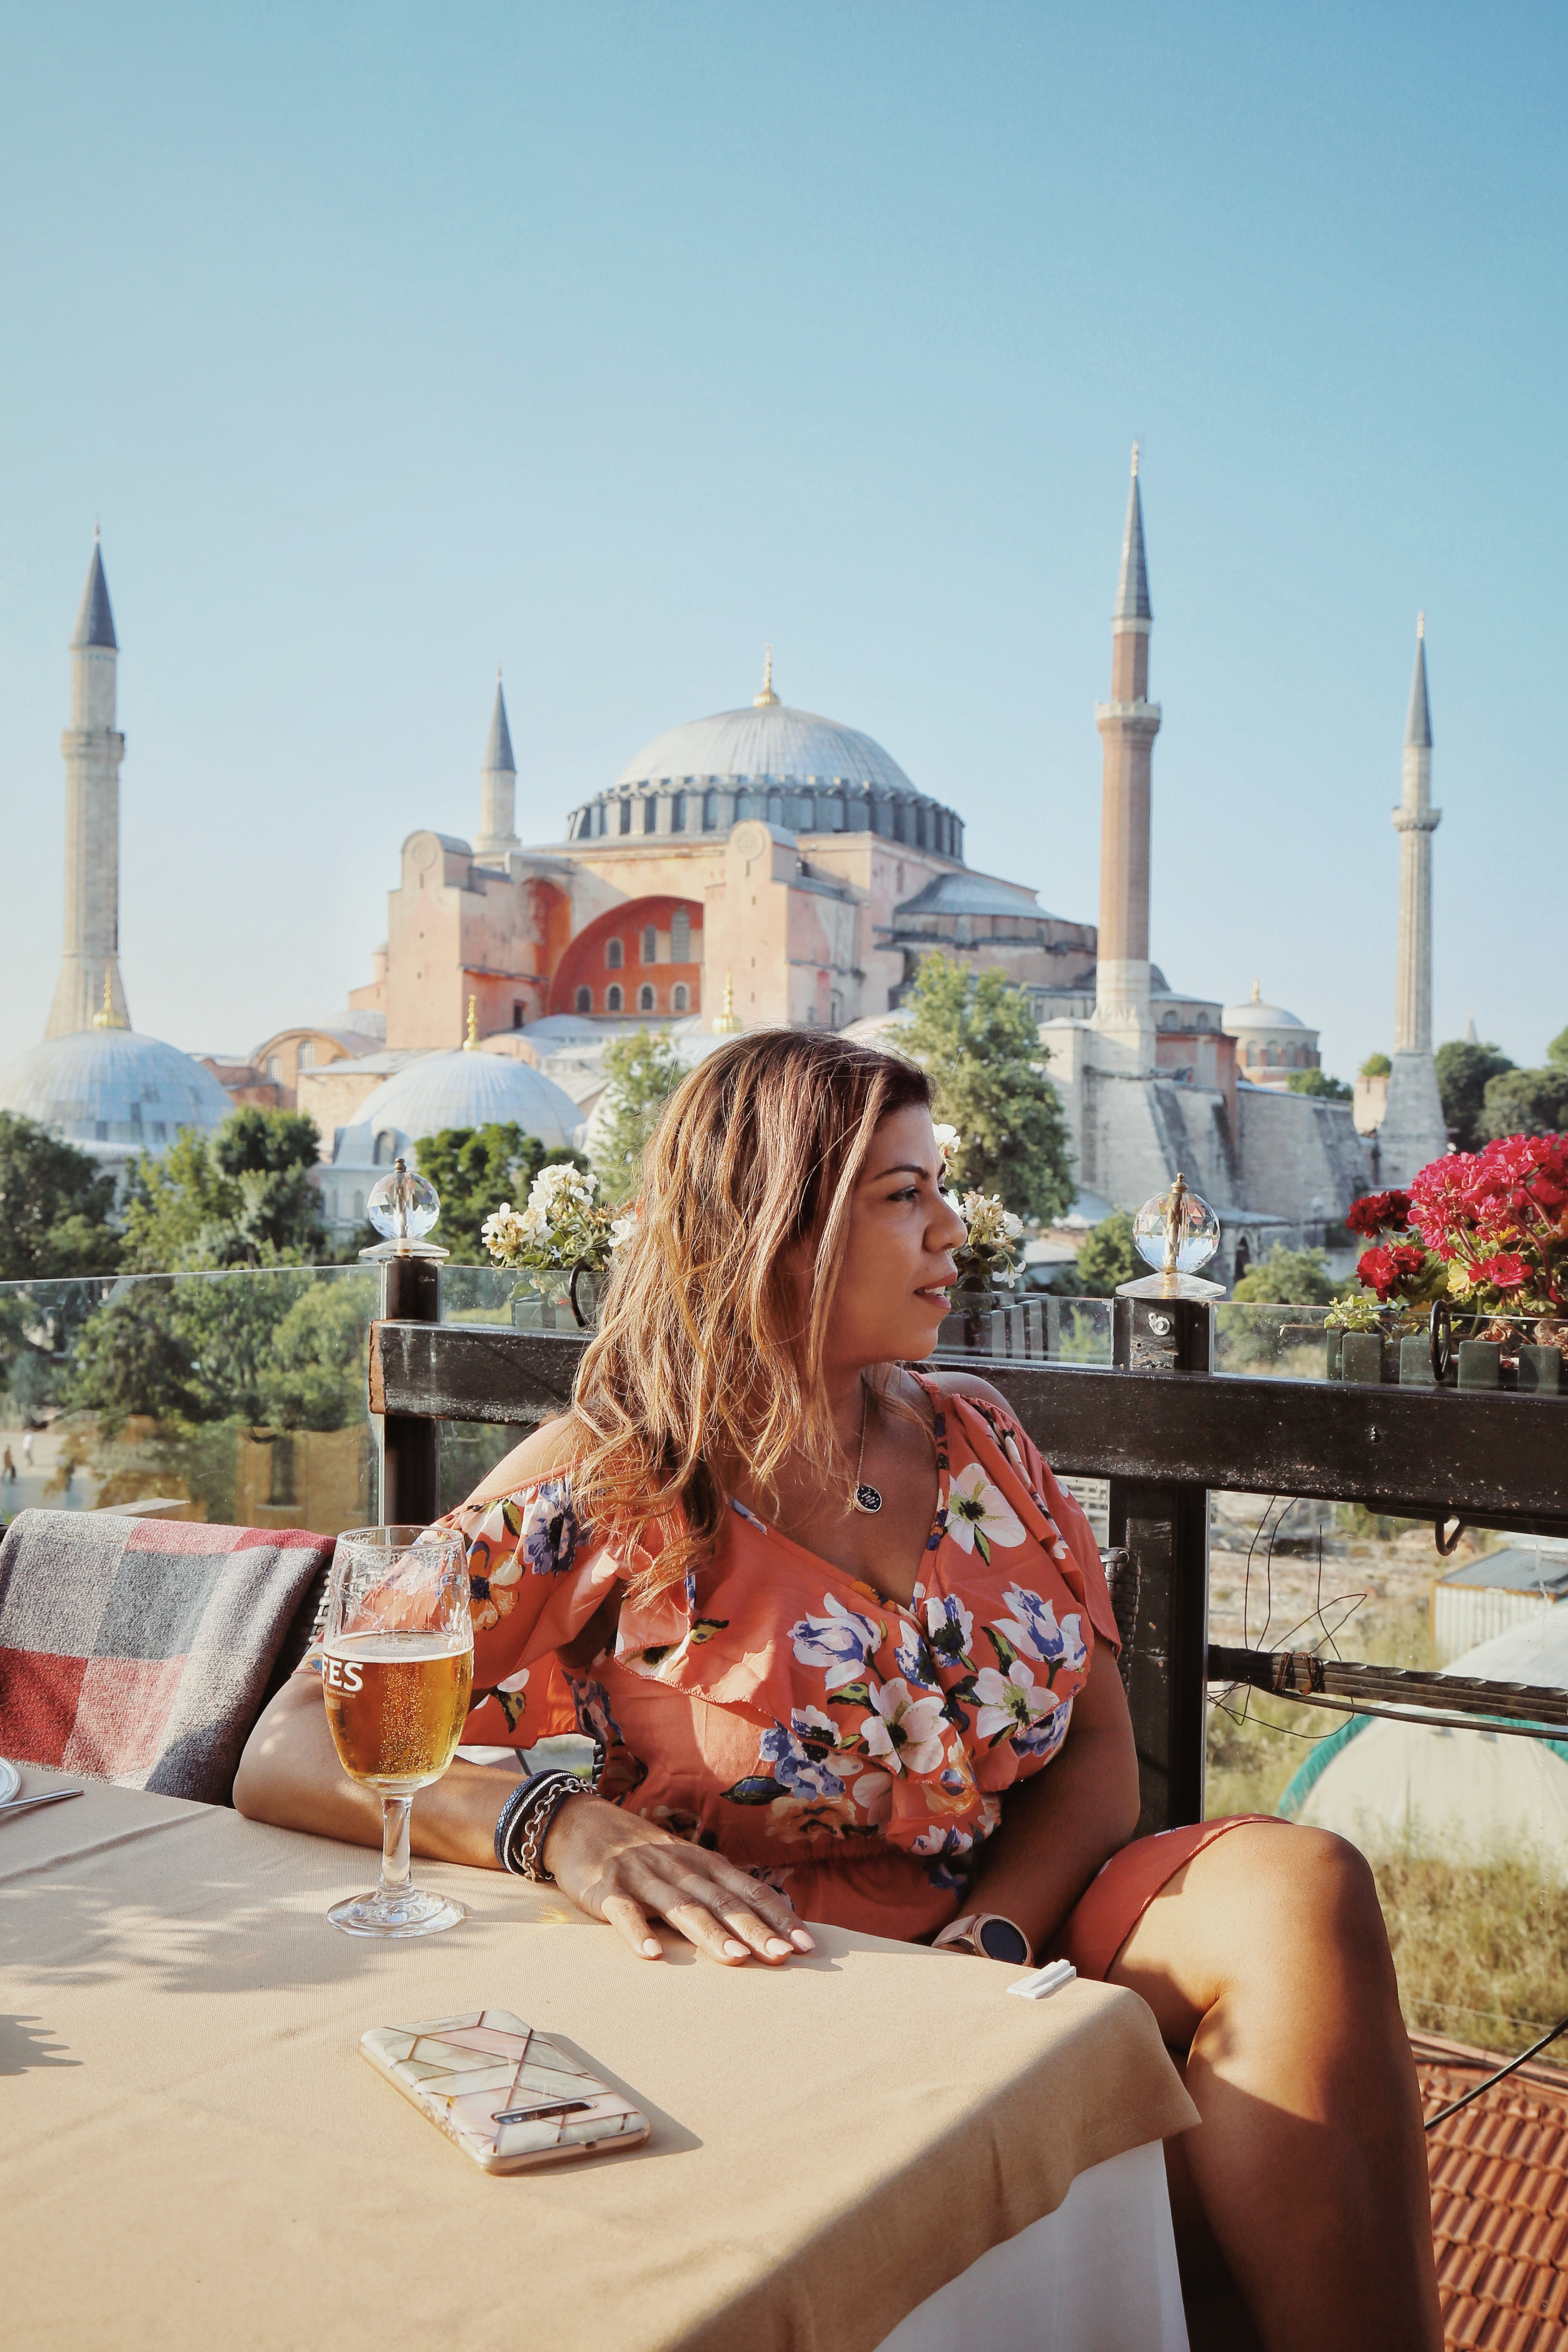 The Best Photo Spot for Hagia Sophia